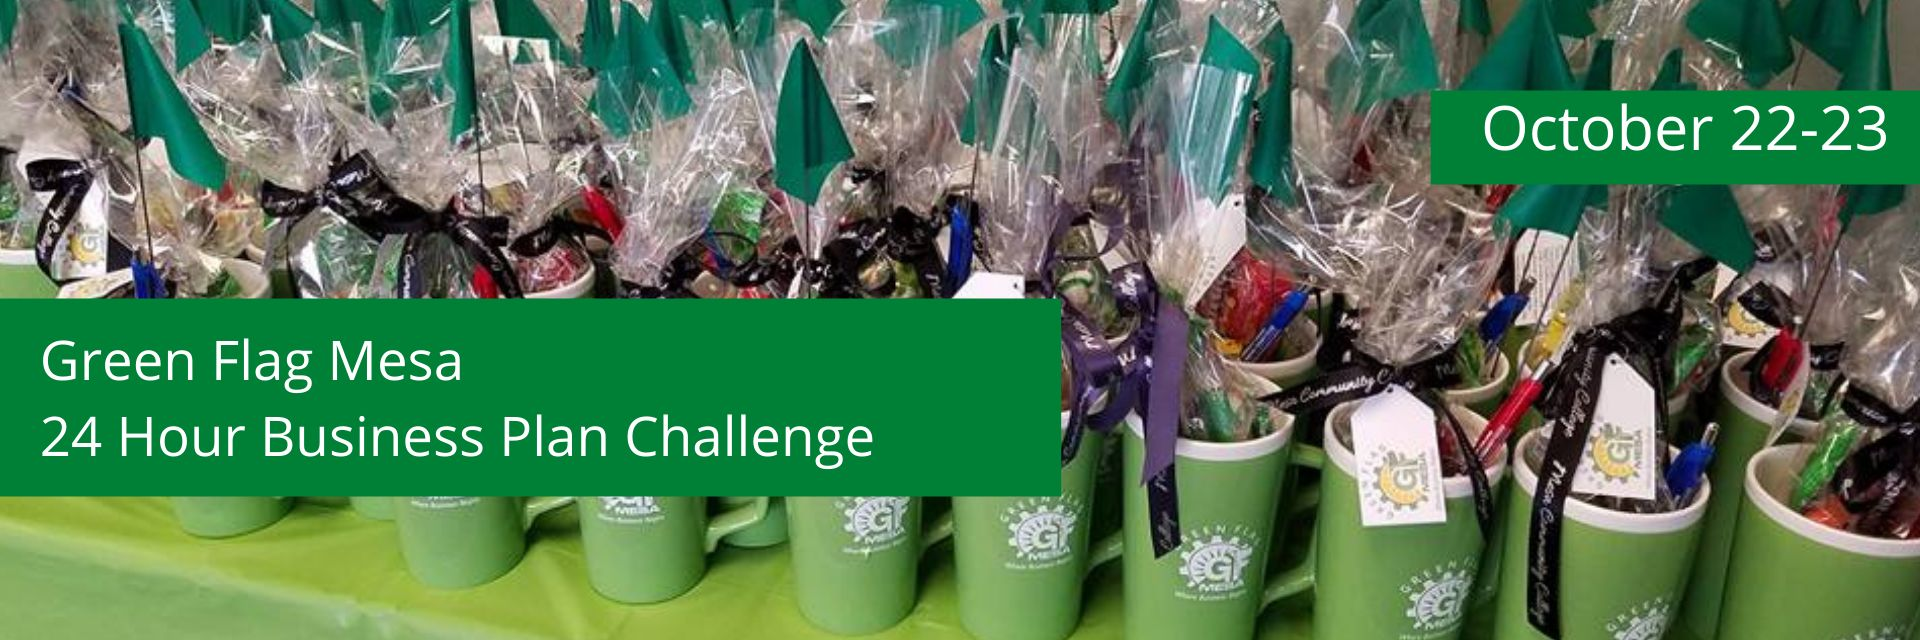 green flag mesa 24 hour business plan challenge